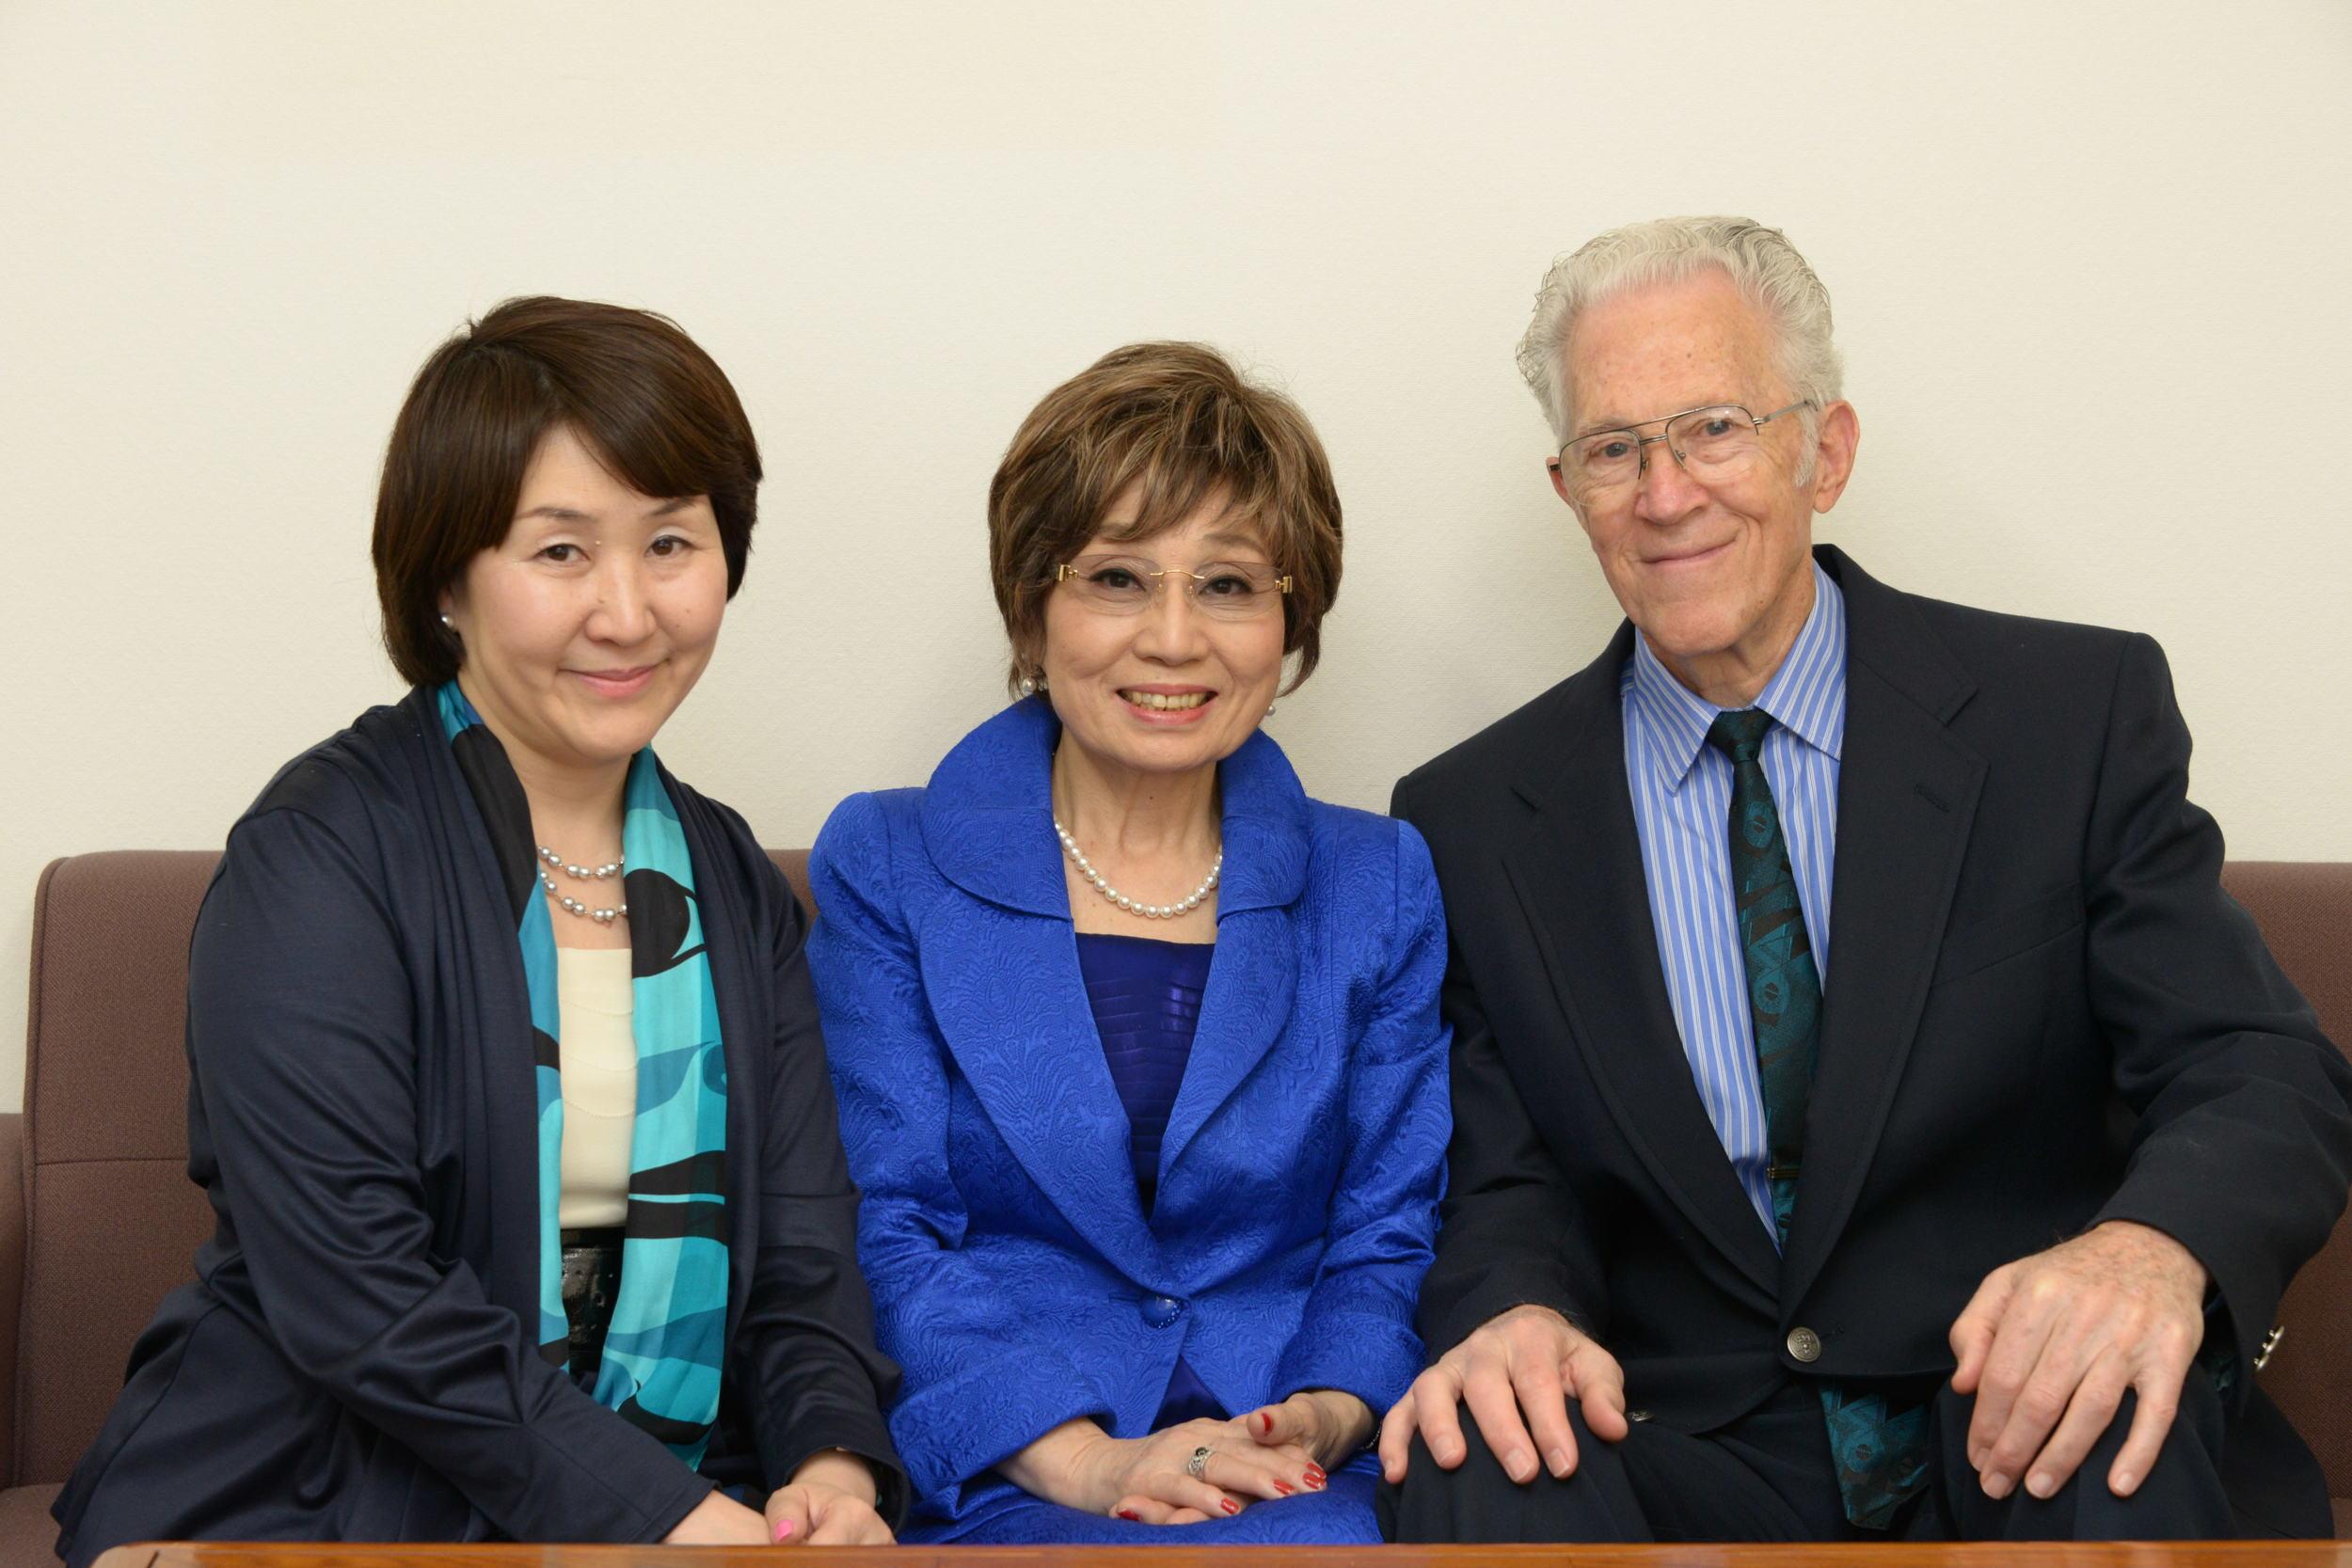 from left: Midori Daikuhara (President), Masumi & Ray Ormandy (Founders of PLS)